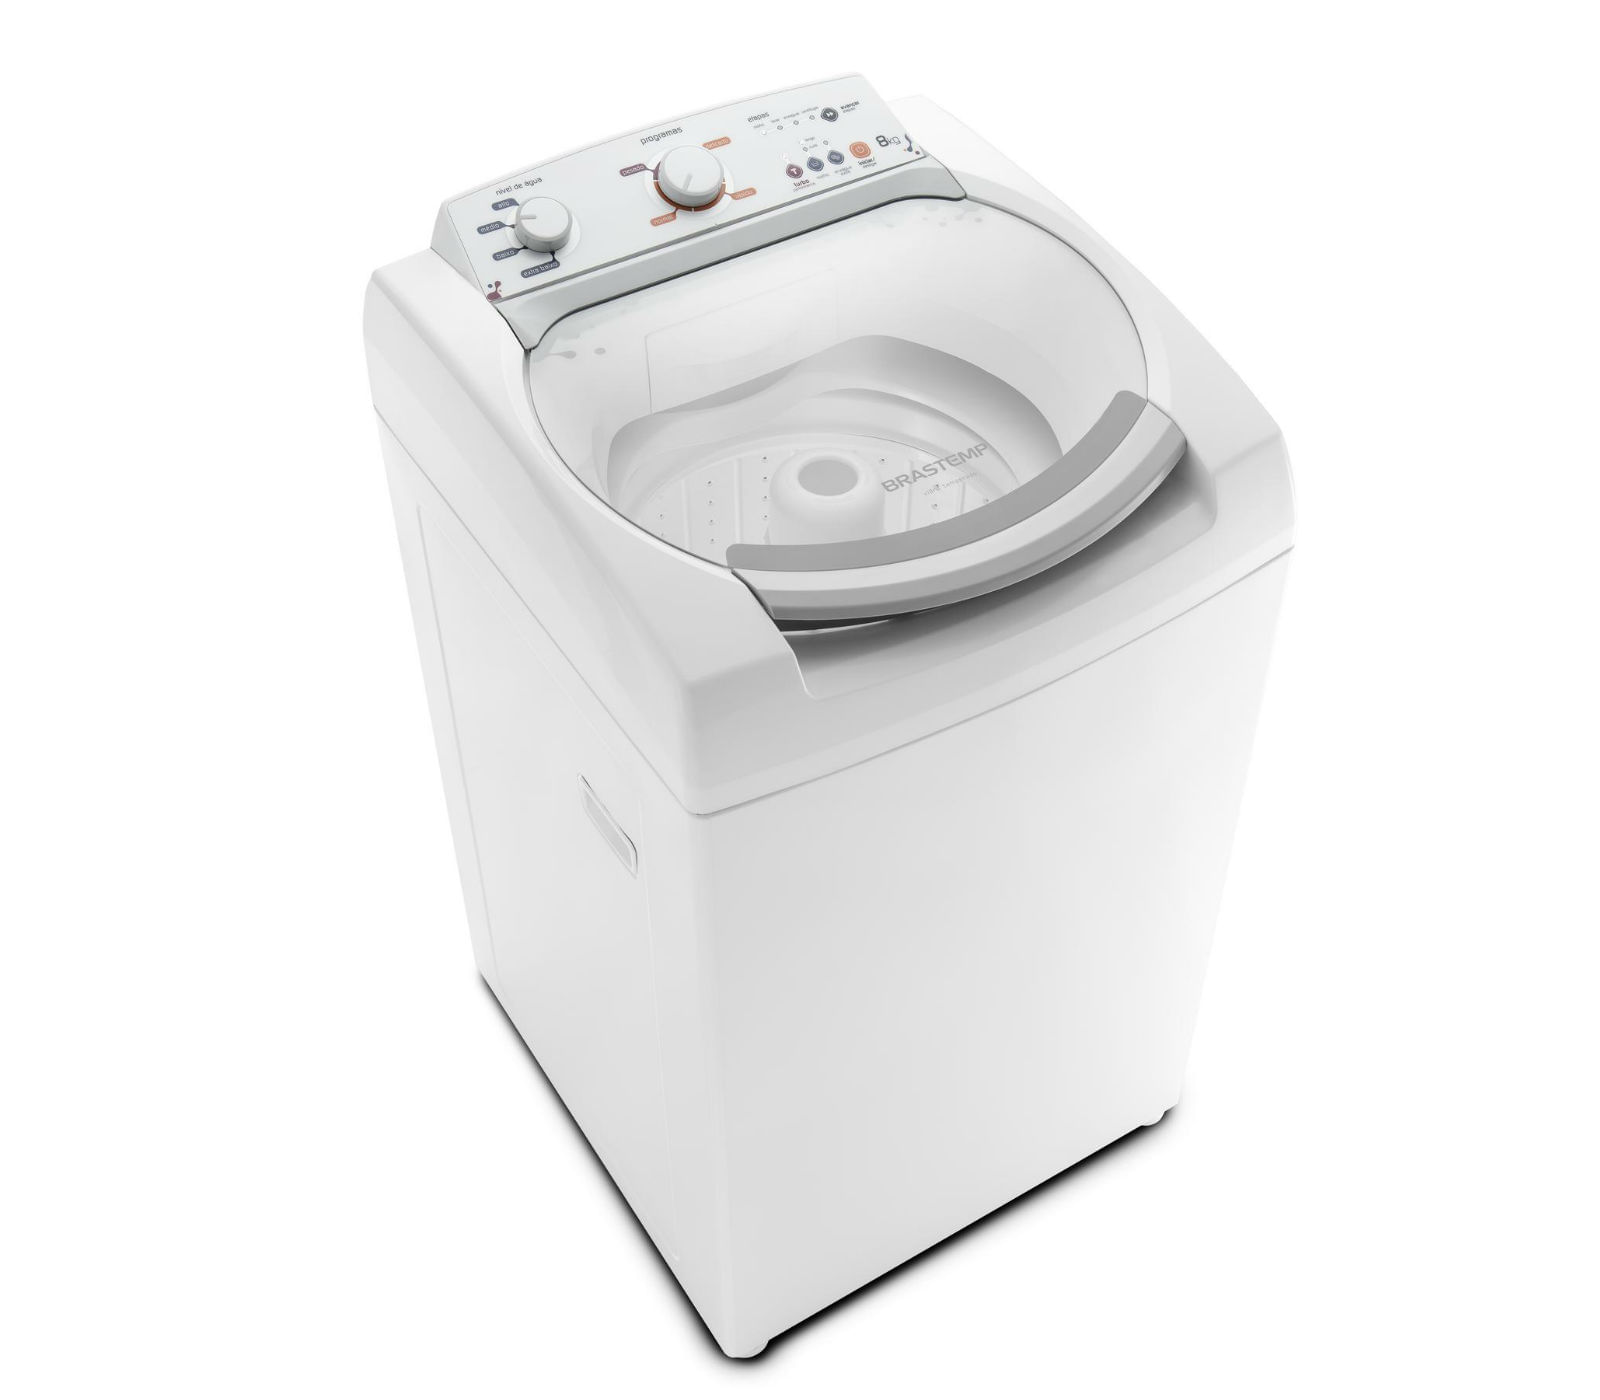 Máquina de Lavar Brastemp Clean 8Kg Turbo Performance e Enxágue Extra